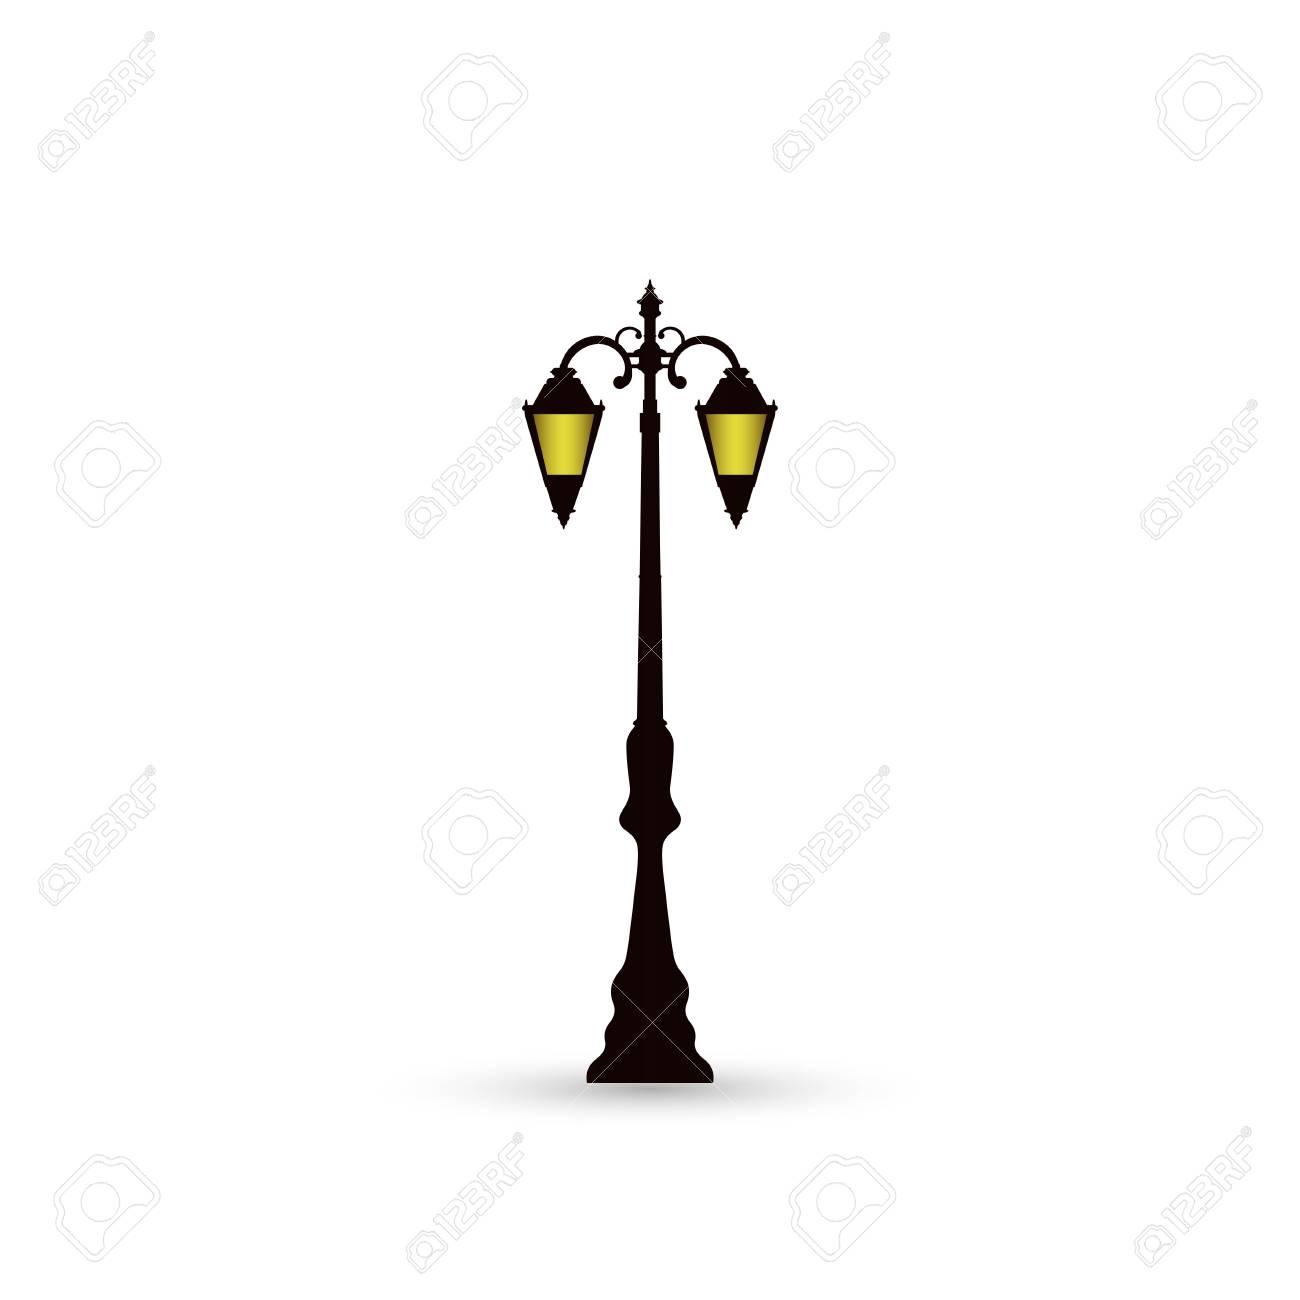 1300x1300 Street Light Pole Vectors